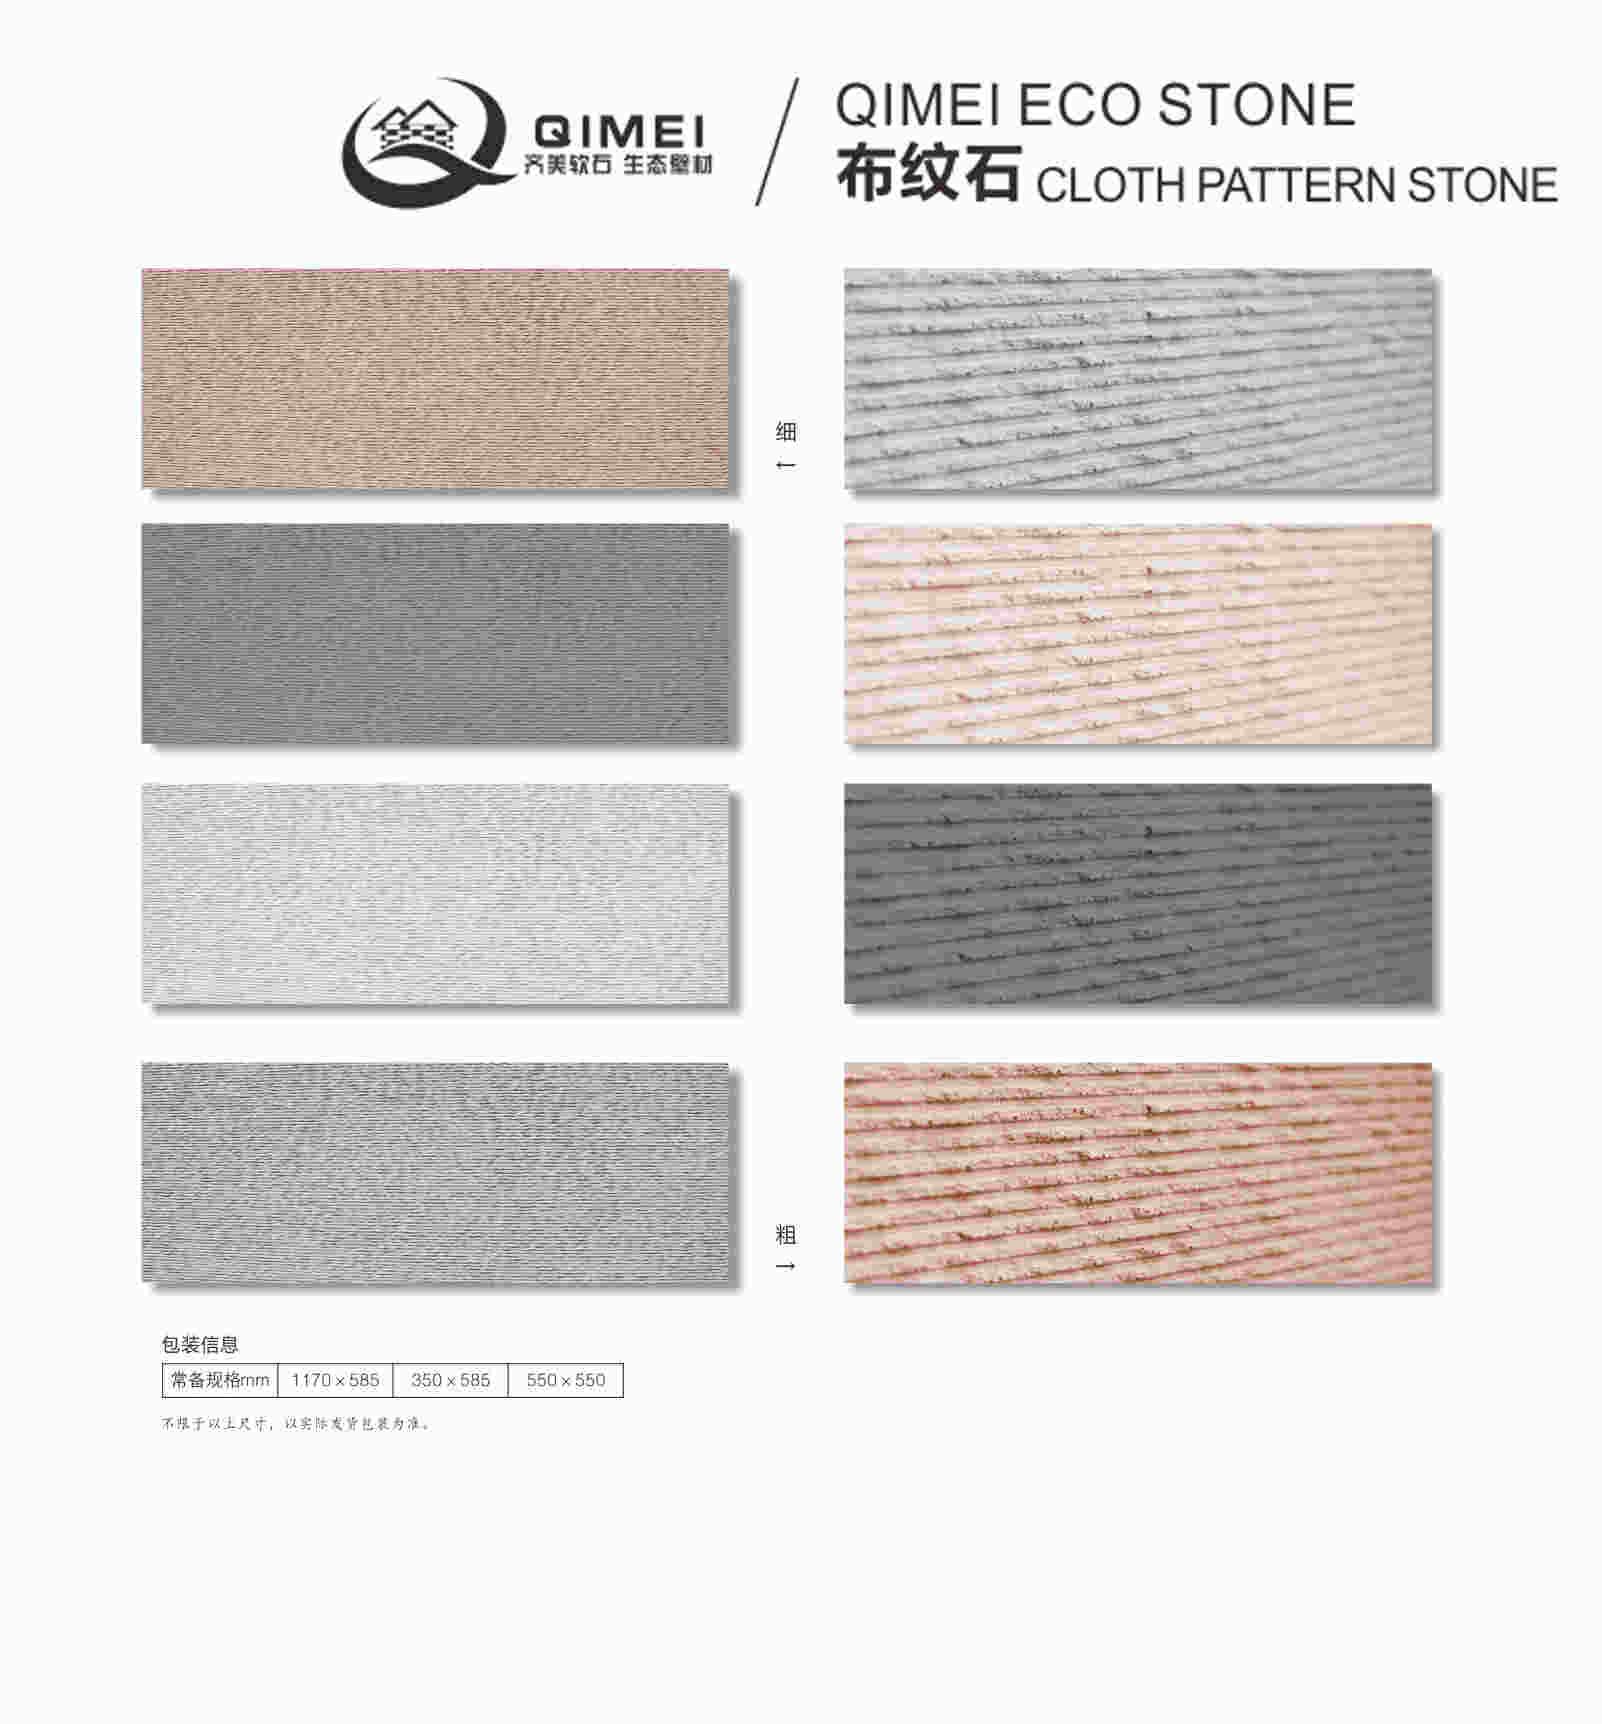 CHINA Jiangsu baidai light weight and safety stone artificial natural stone pattern/texture